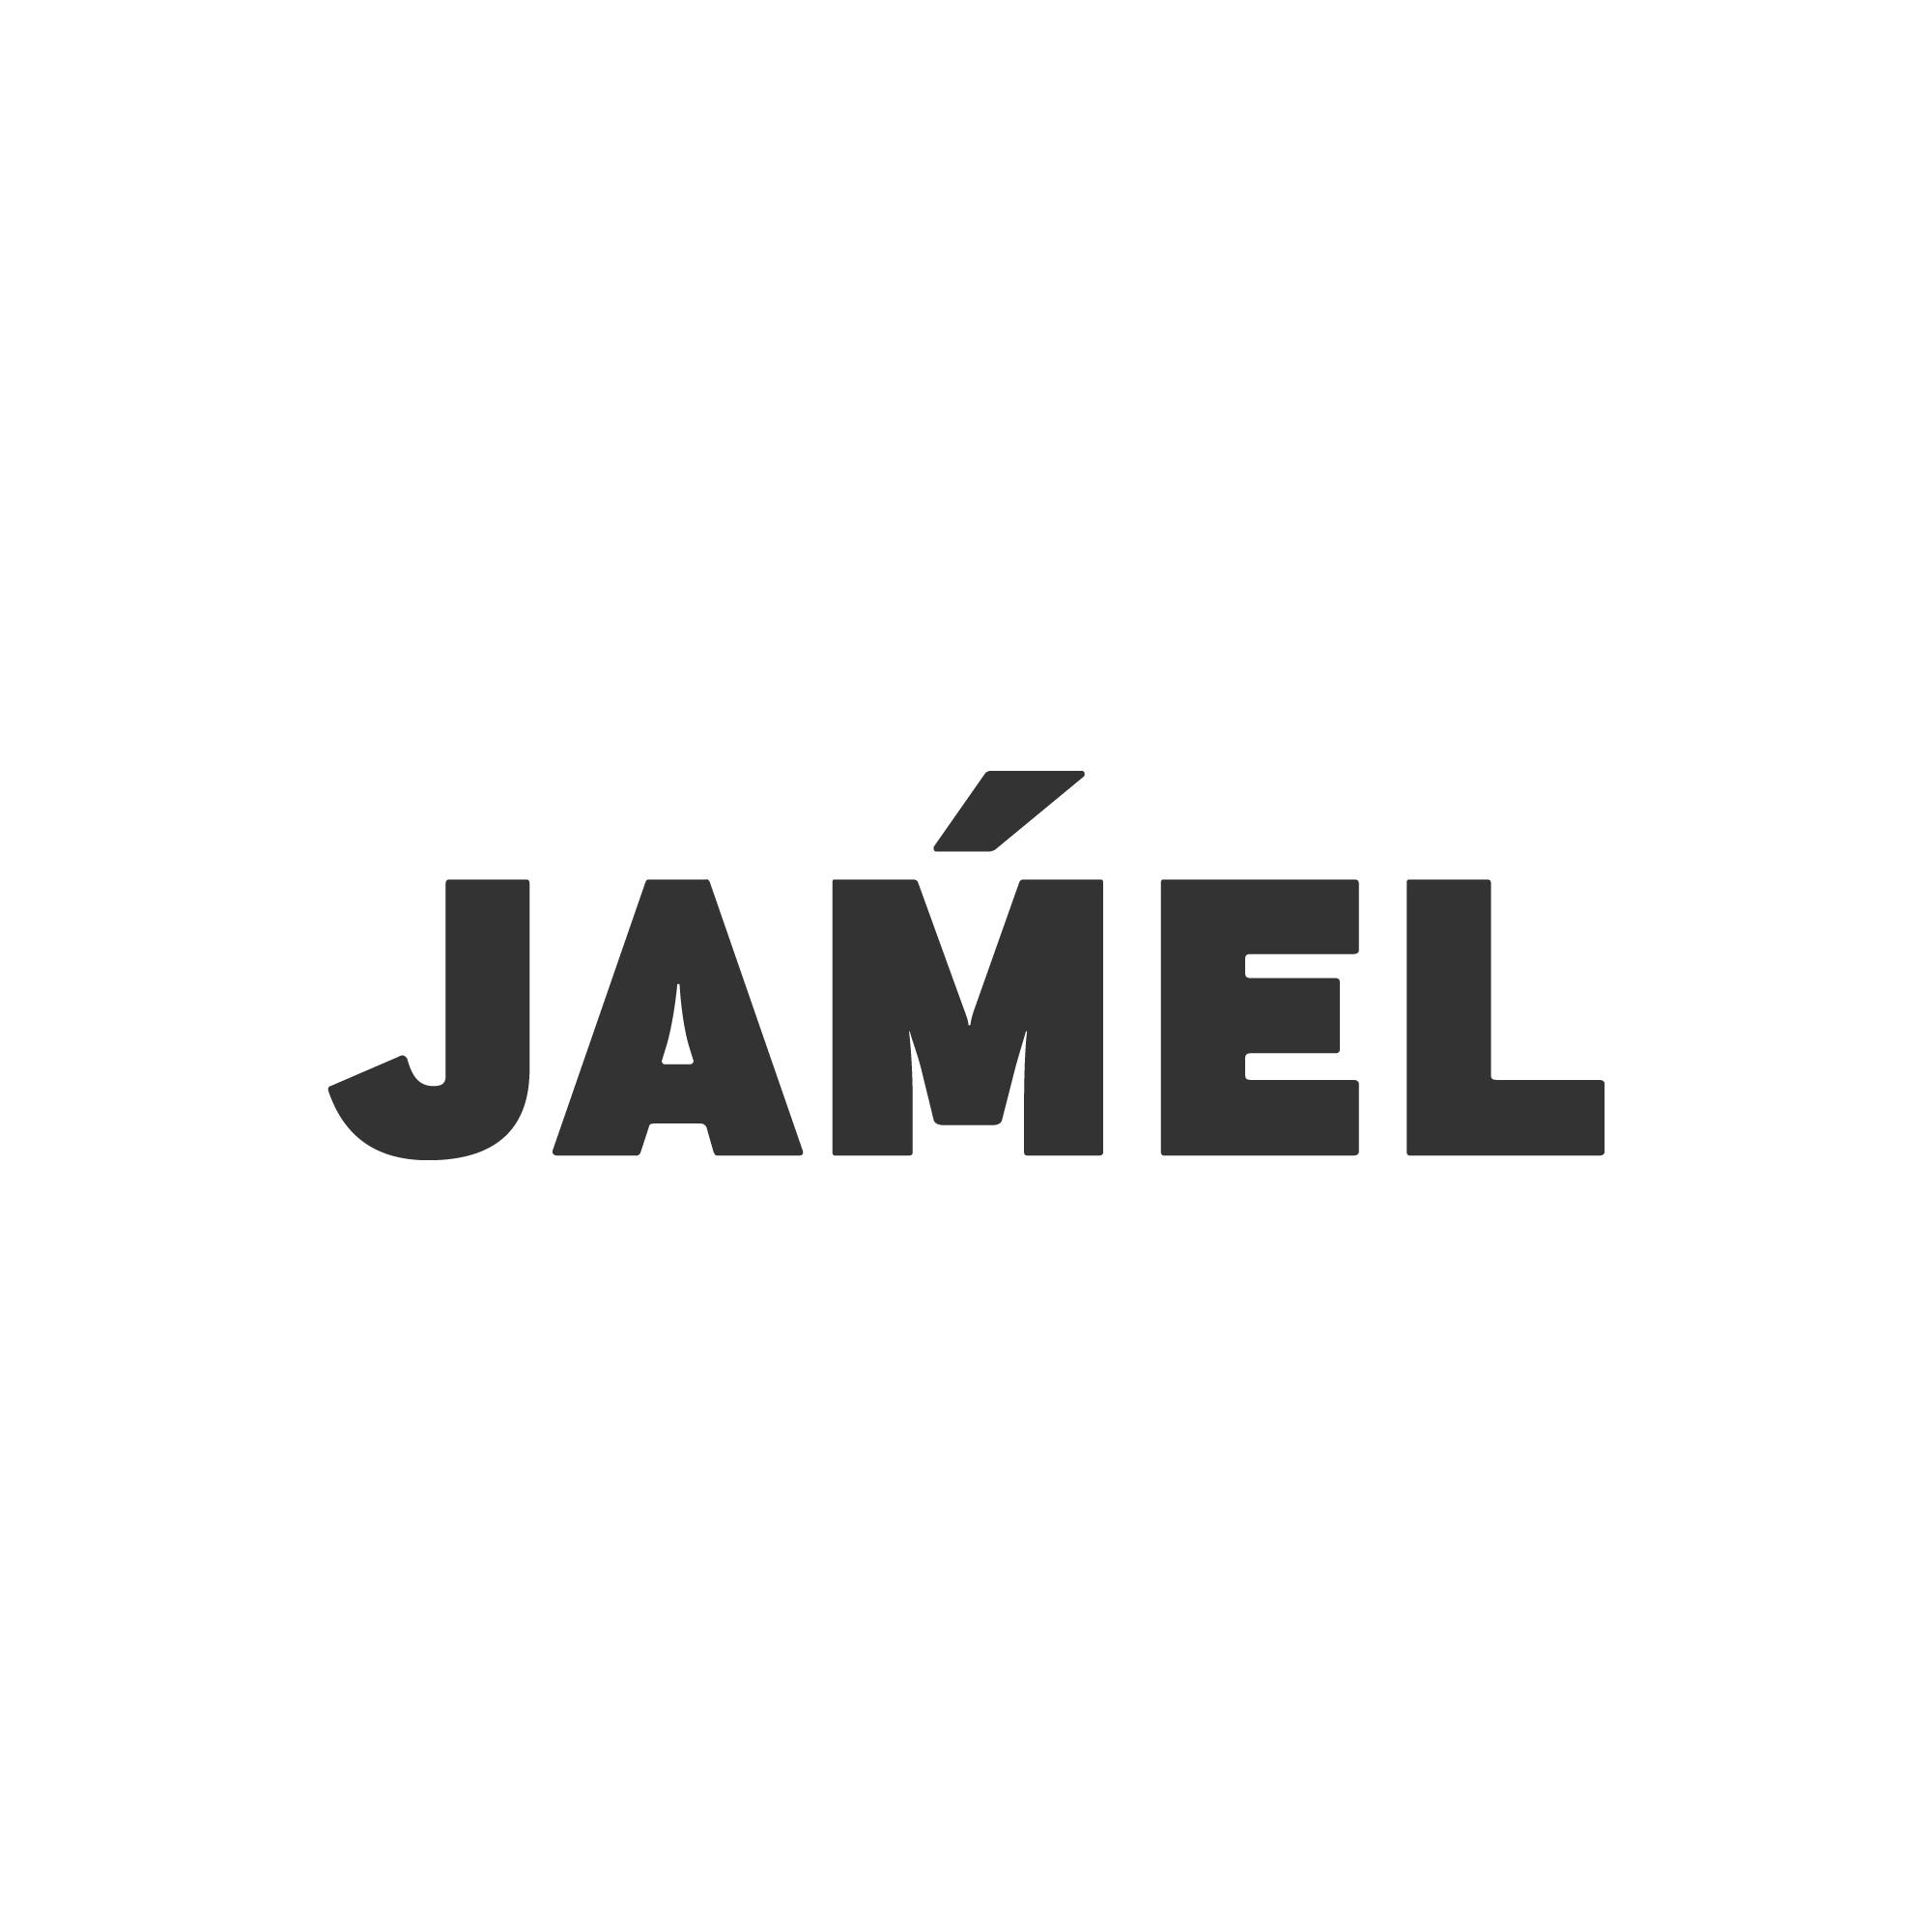 JAMEL INTERACTIVE